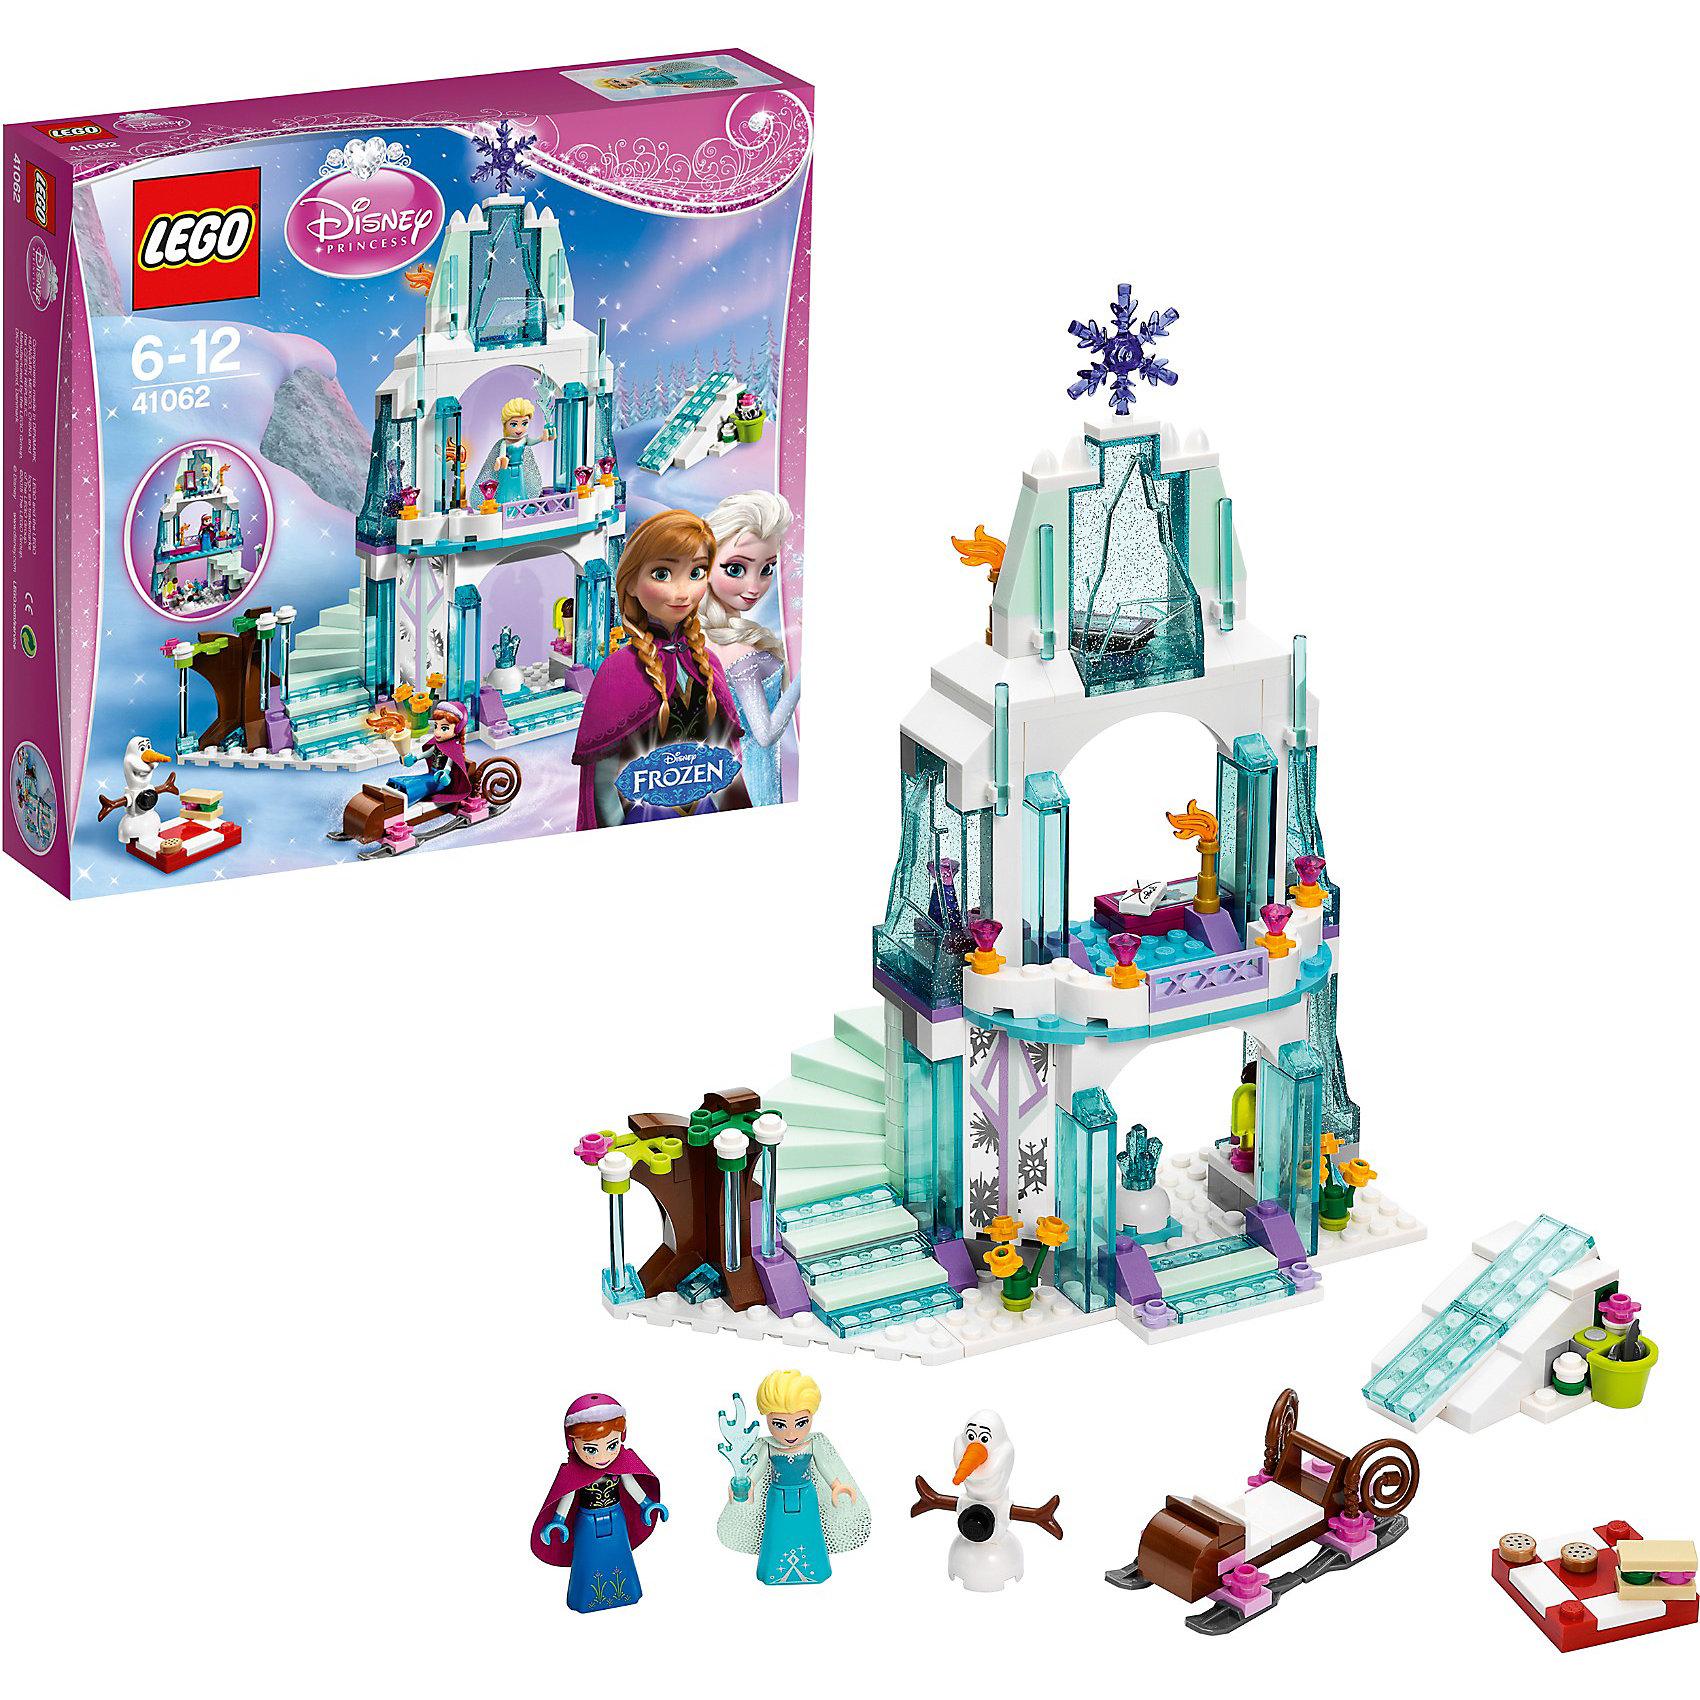 LEGO LEGO Disney Princesses 41062: Ледяной замок Эльзы lego lego disney princesses волшебный ледяной замок эльзы